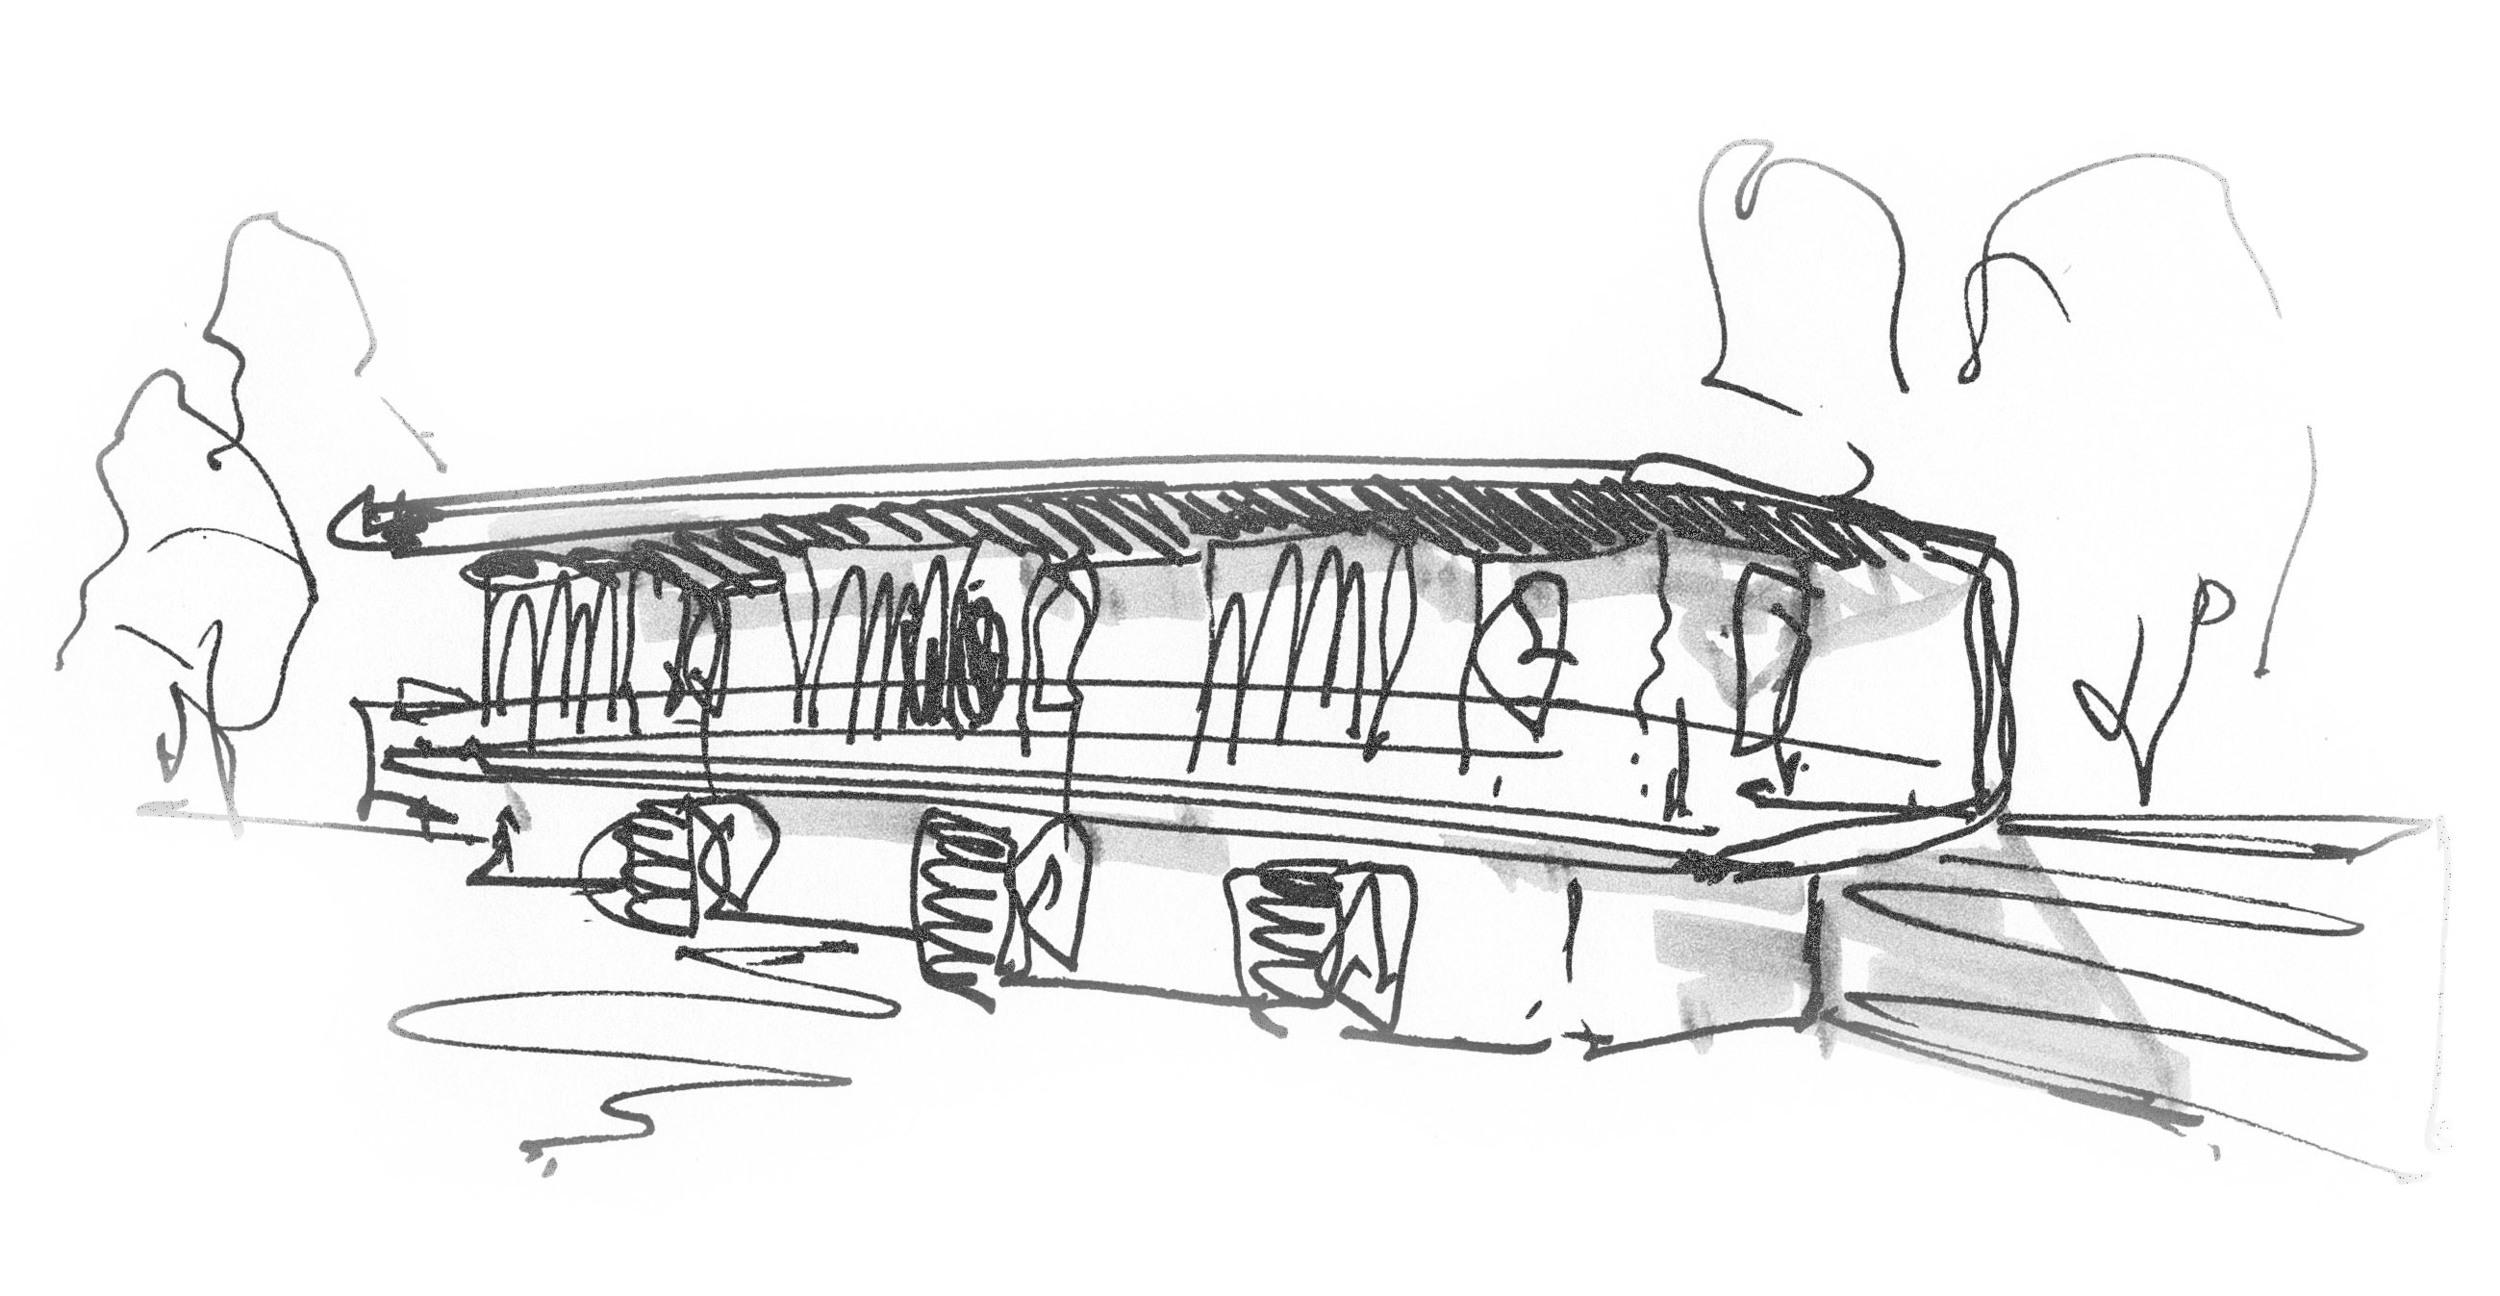 hr-sketch.png